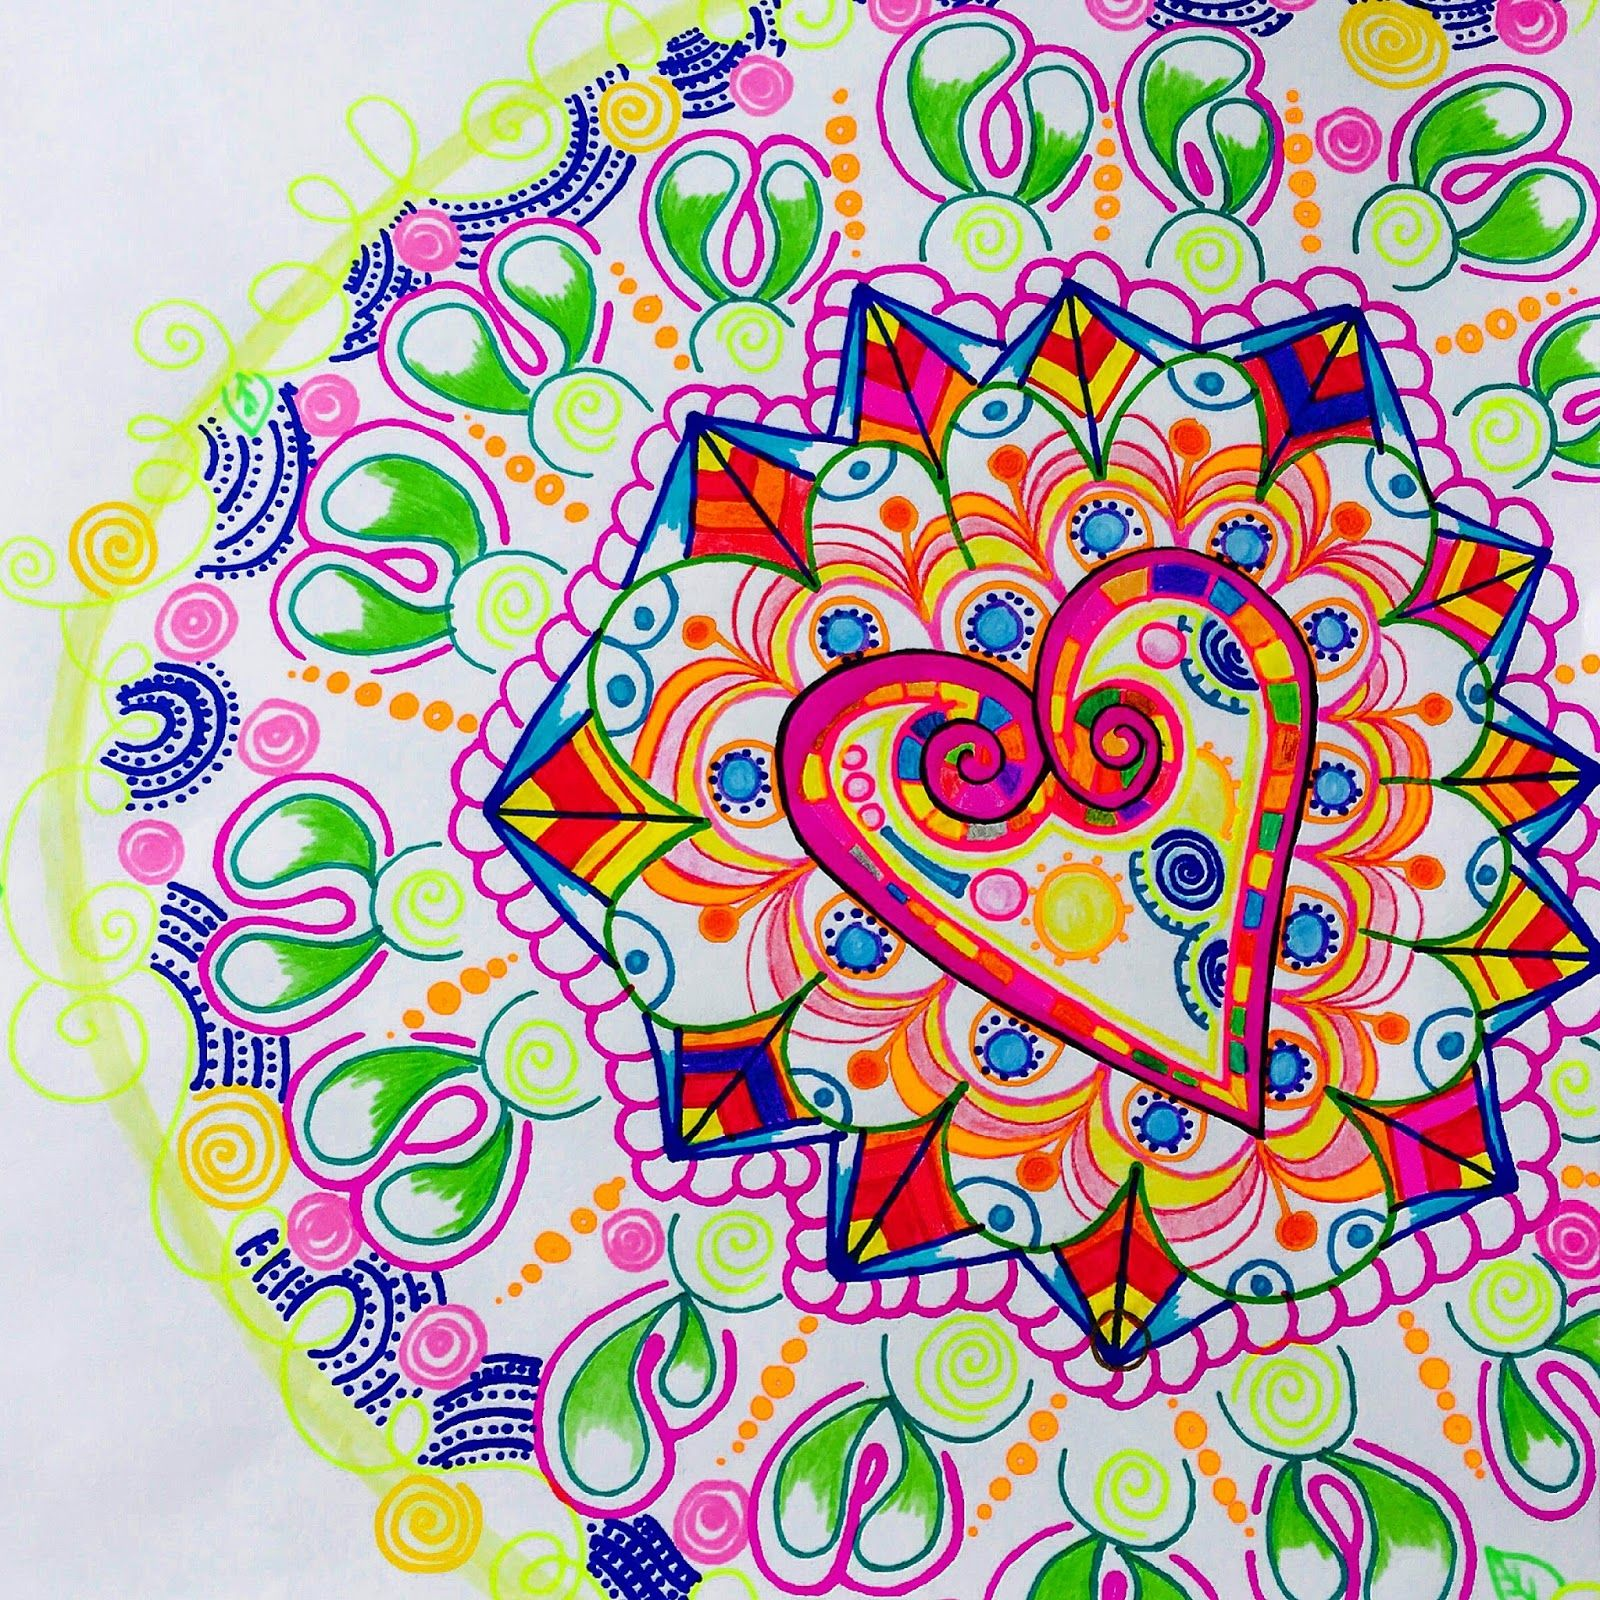 zentangle #mandala #corazon | @MissOjosArt | Pinterest